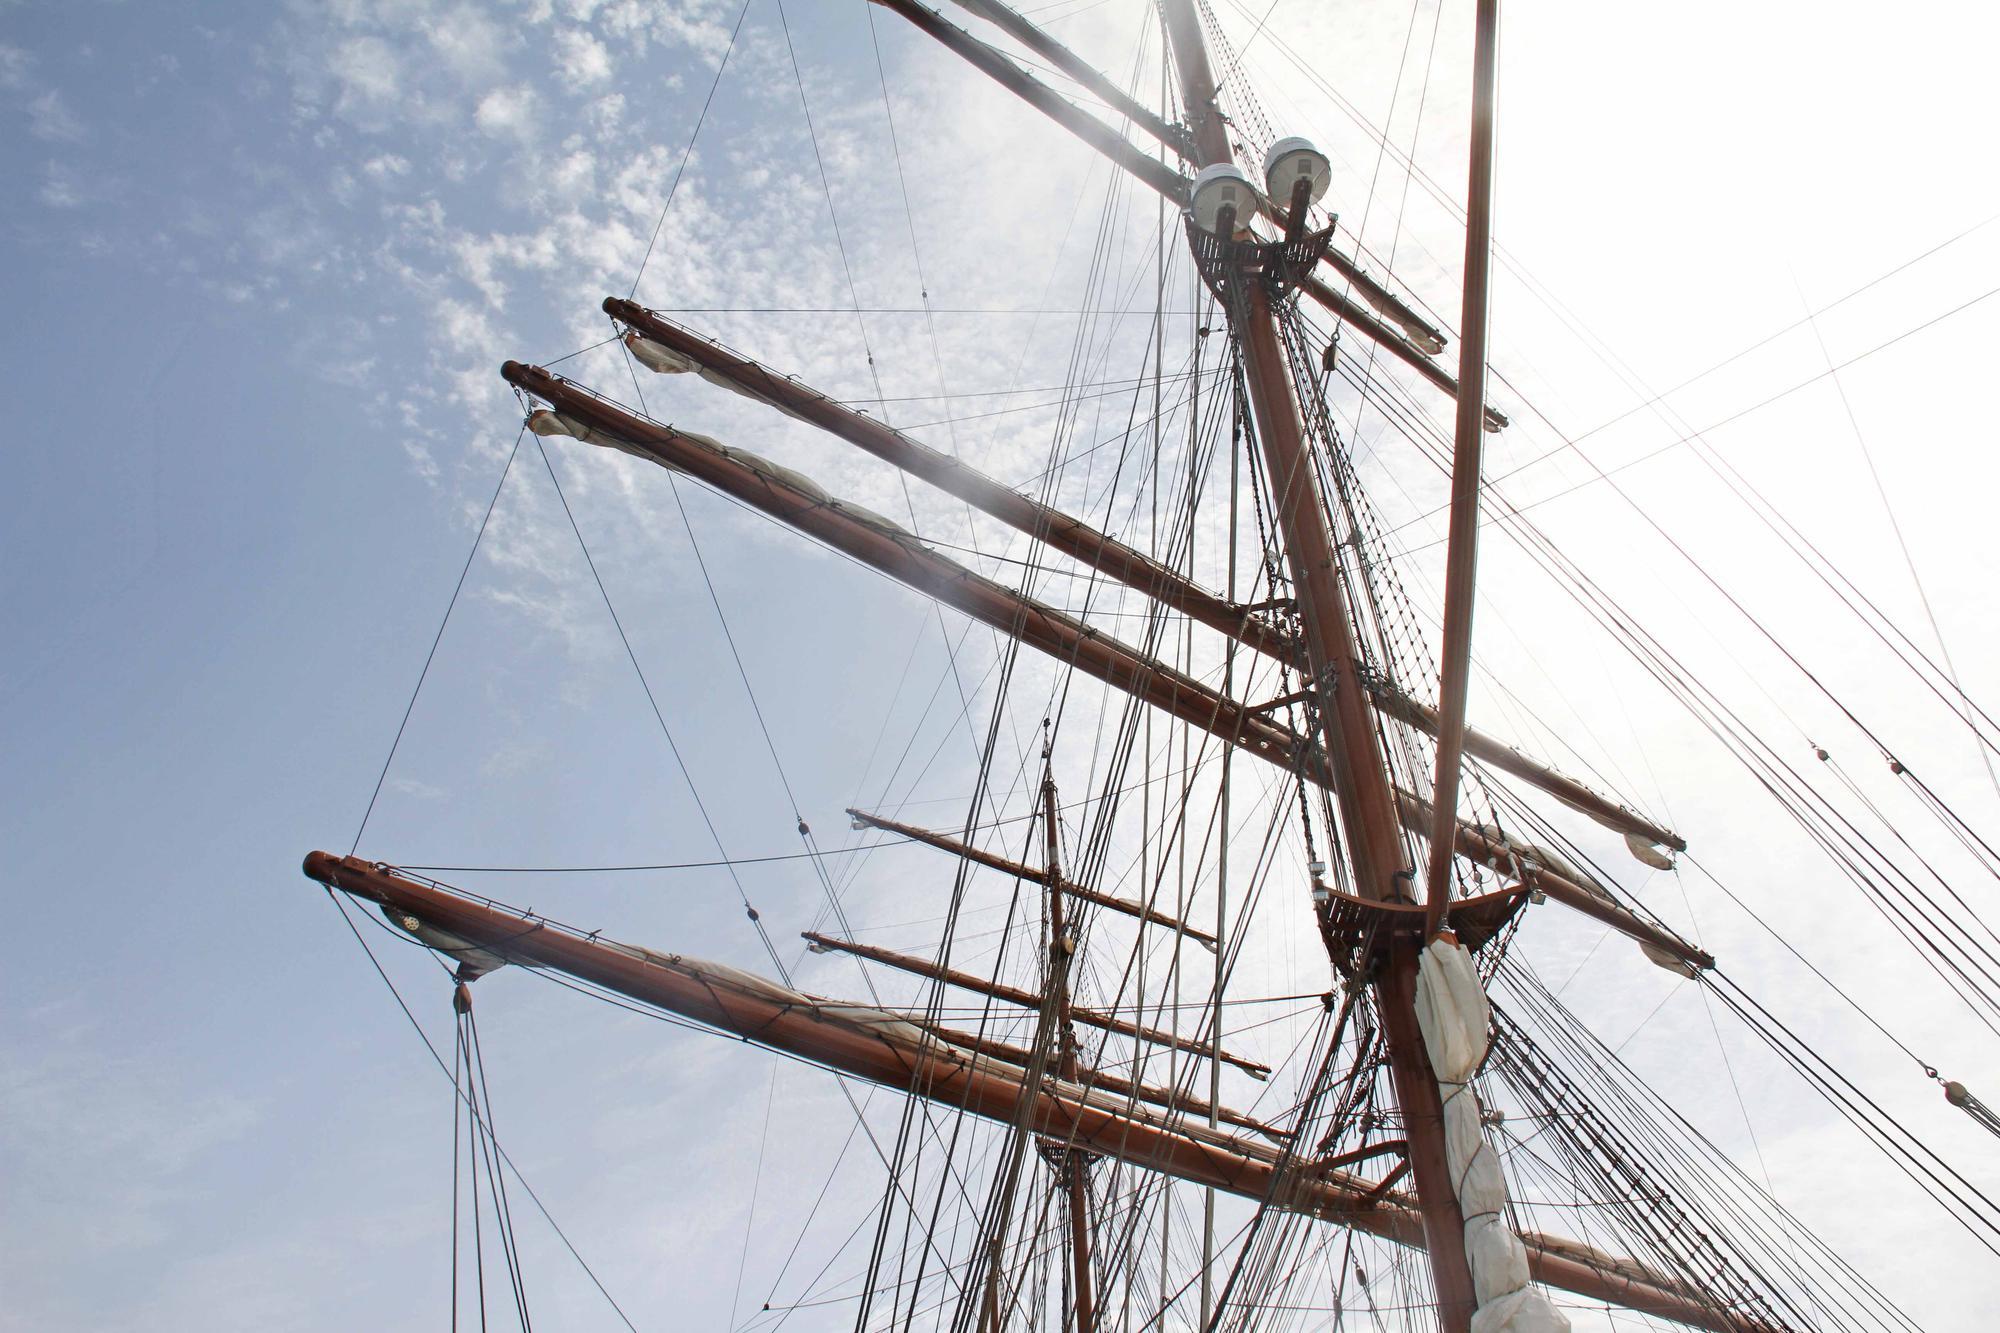 Entrega de la metopa al 'Sea Cloud Spirit' por parte de la Autoritat Portuària